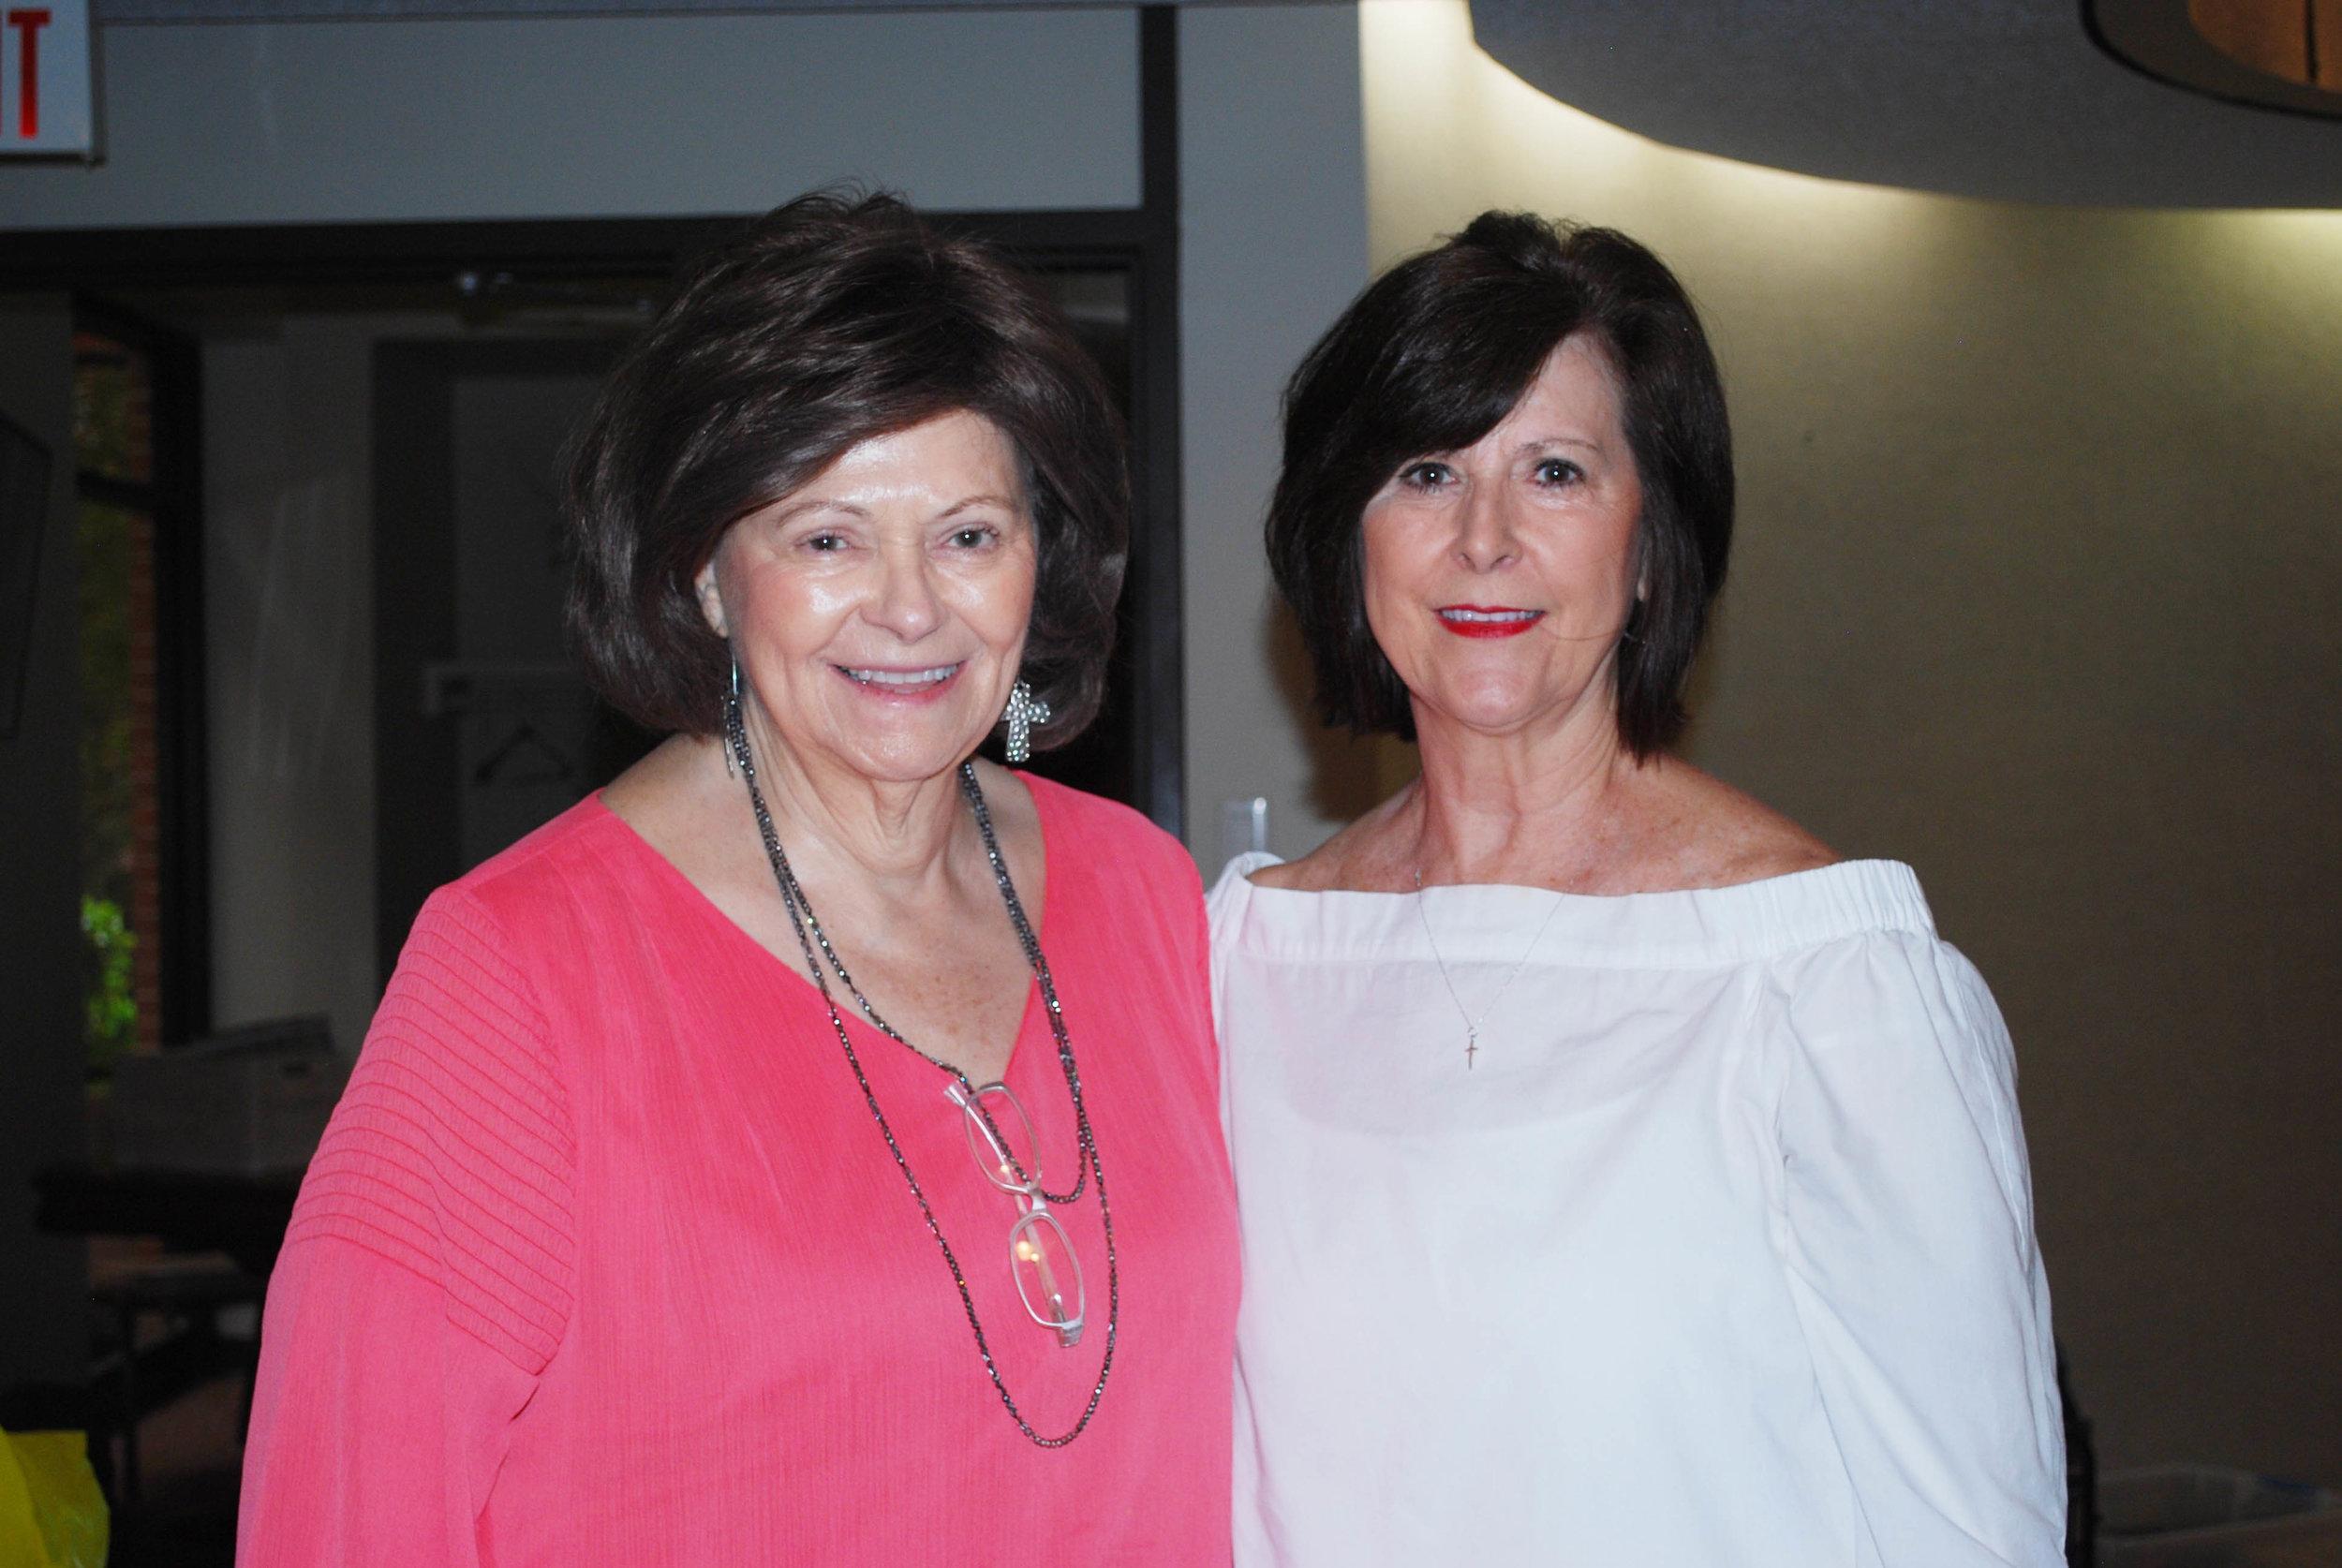 Brenda Hogan and Debbie Sharp